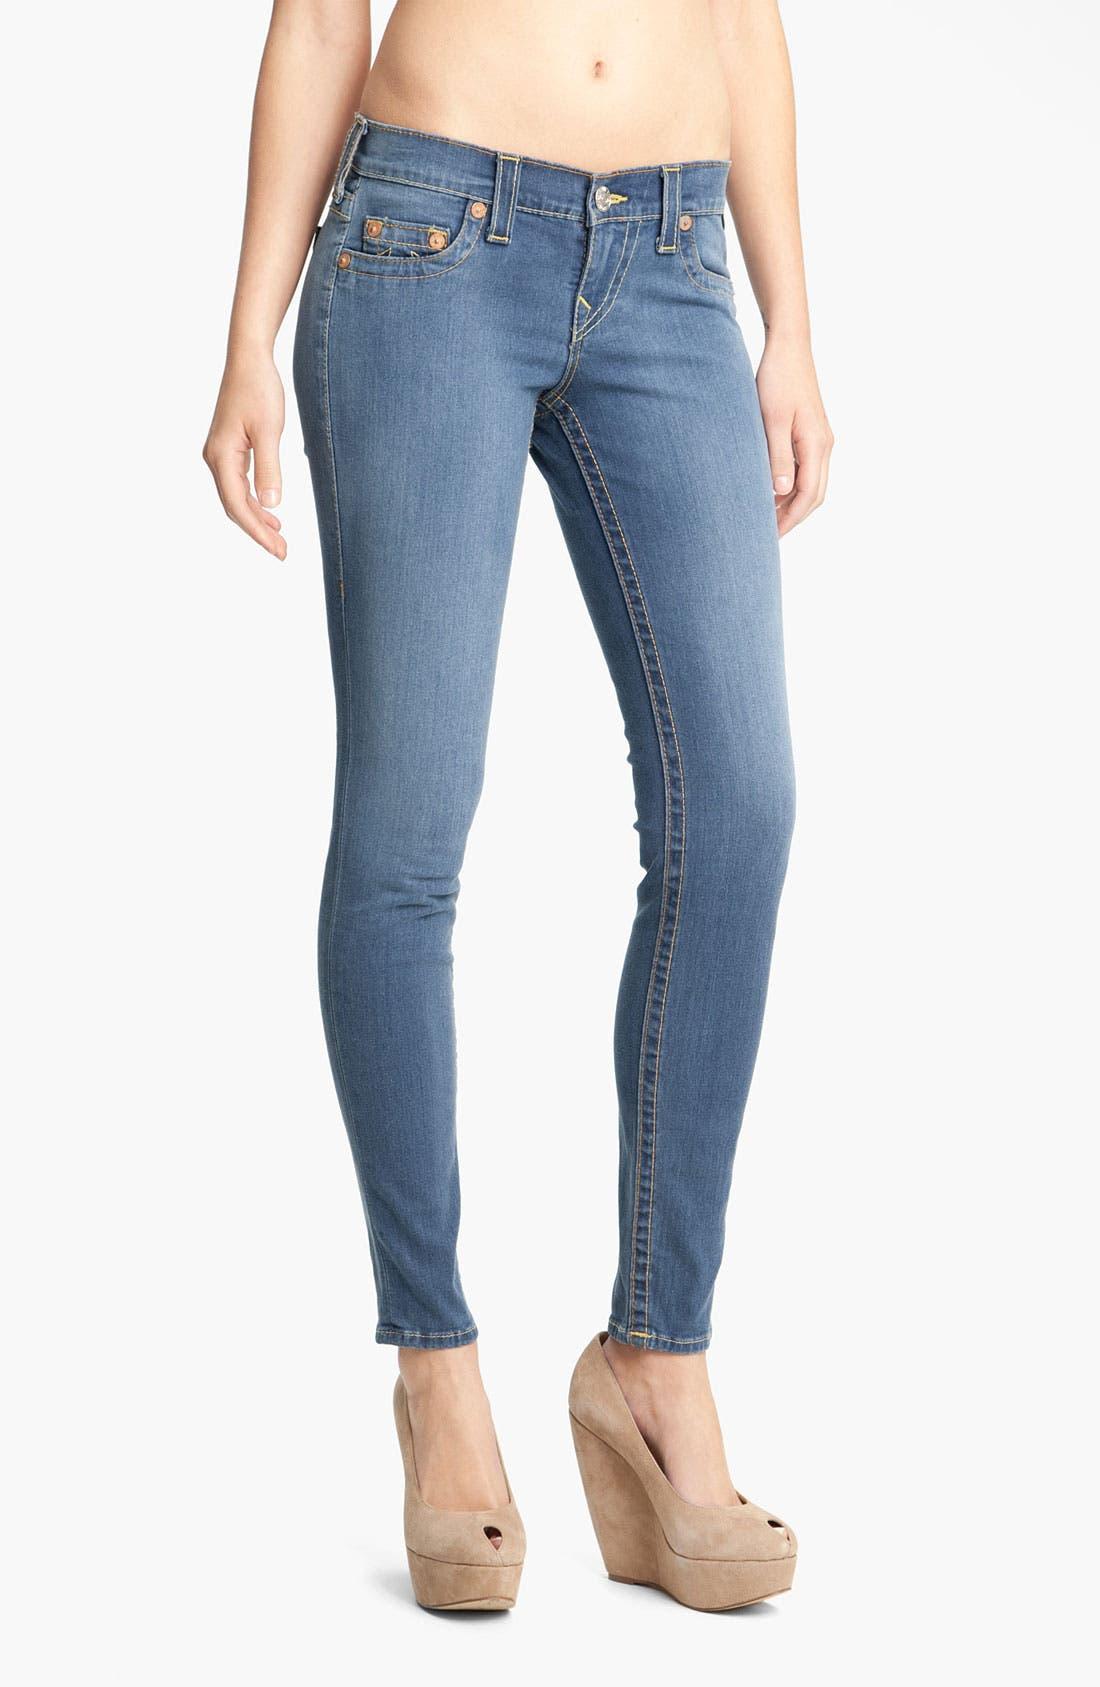 Alternate Image 1 Selected - True Religion Brand Jeans 'Casey' Skinny Stretch Jeans (Stingray)